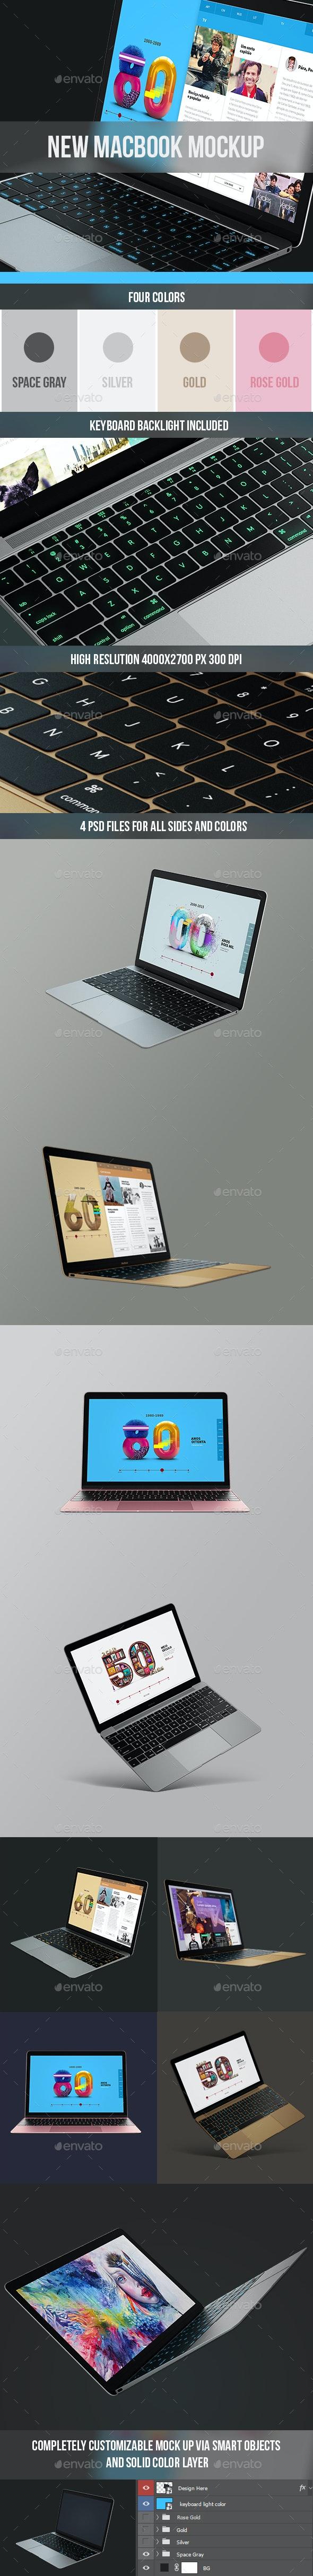 The New Macbook Mockup - Laptop Displays